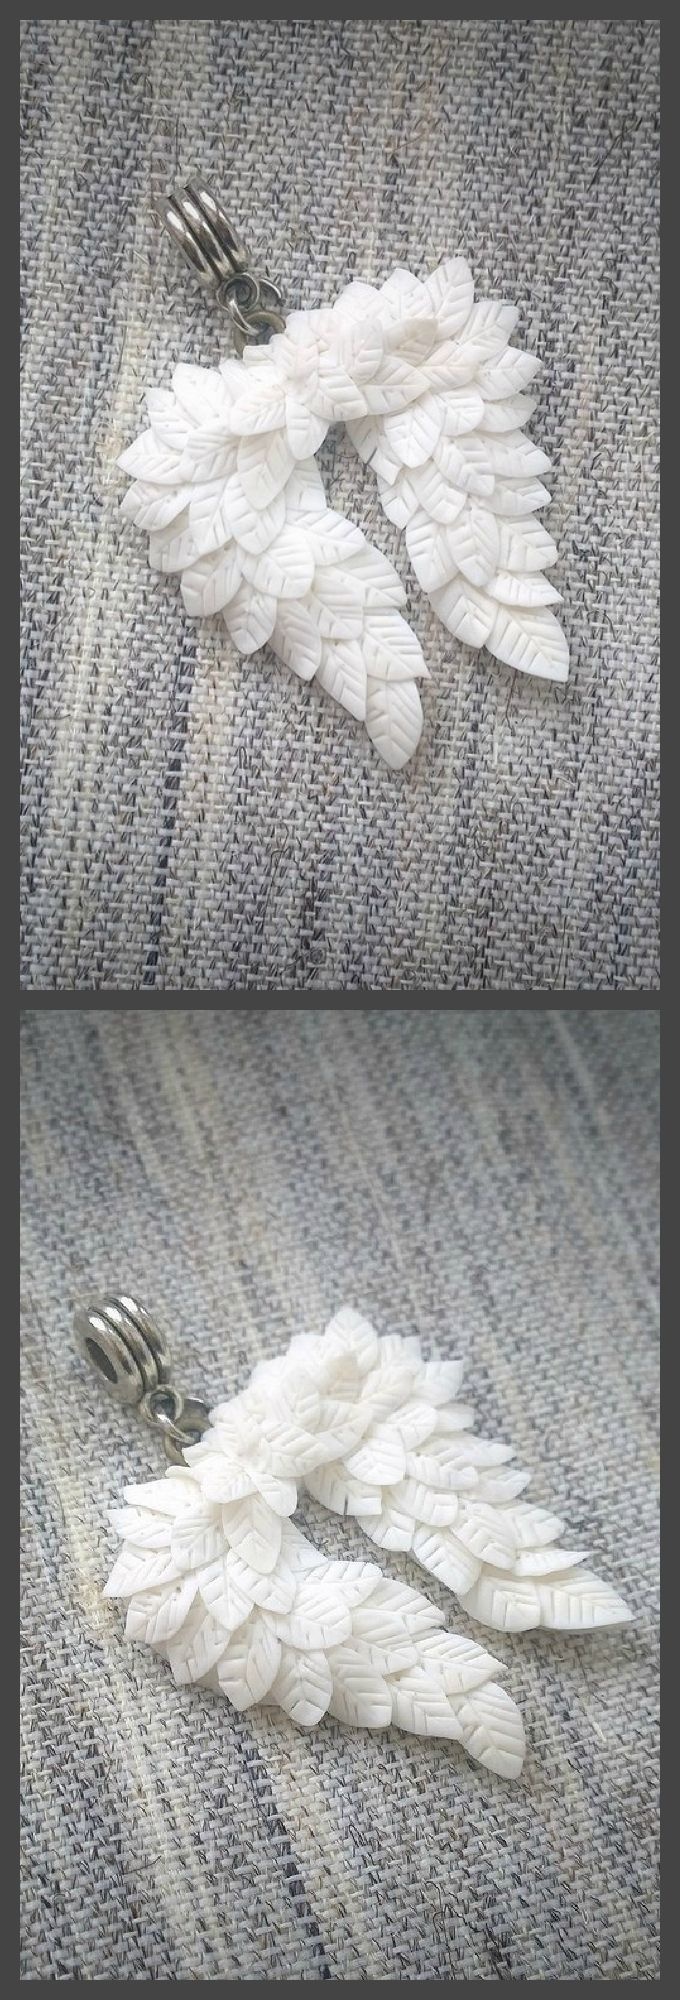 #polymerclay #angelwings #white  #полимернаяглина #хобби #handmade #polymerclay  #fimo #fimoclay #premo #sculpey  #craft # #clay #лепка #angel #silverushka #jewelry #charm